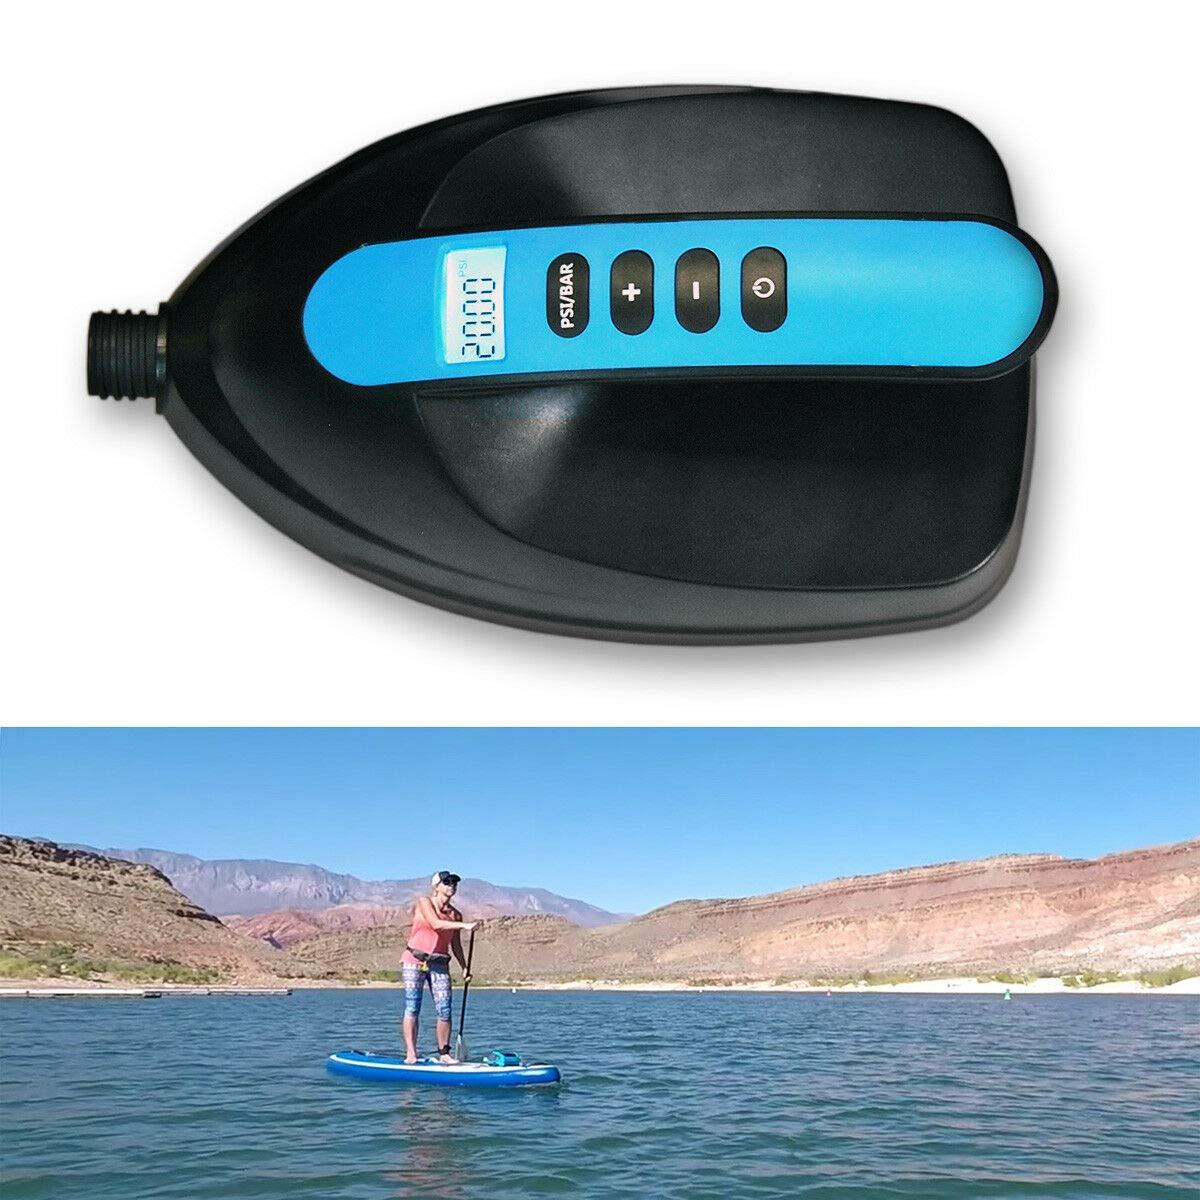 Amazon.com: Xxl-Vibrator 20PSI High12V Digital Air Pump Air ...